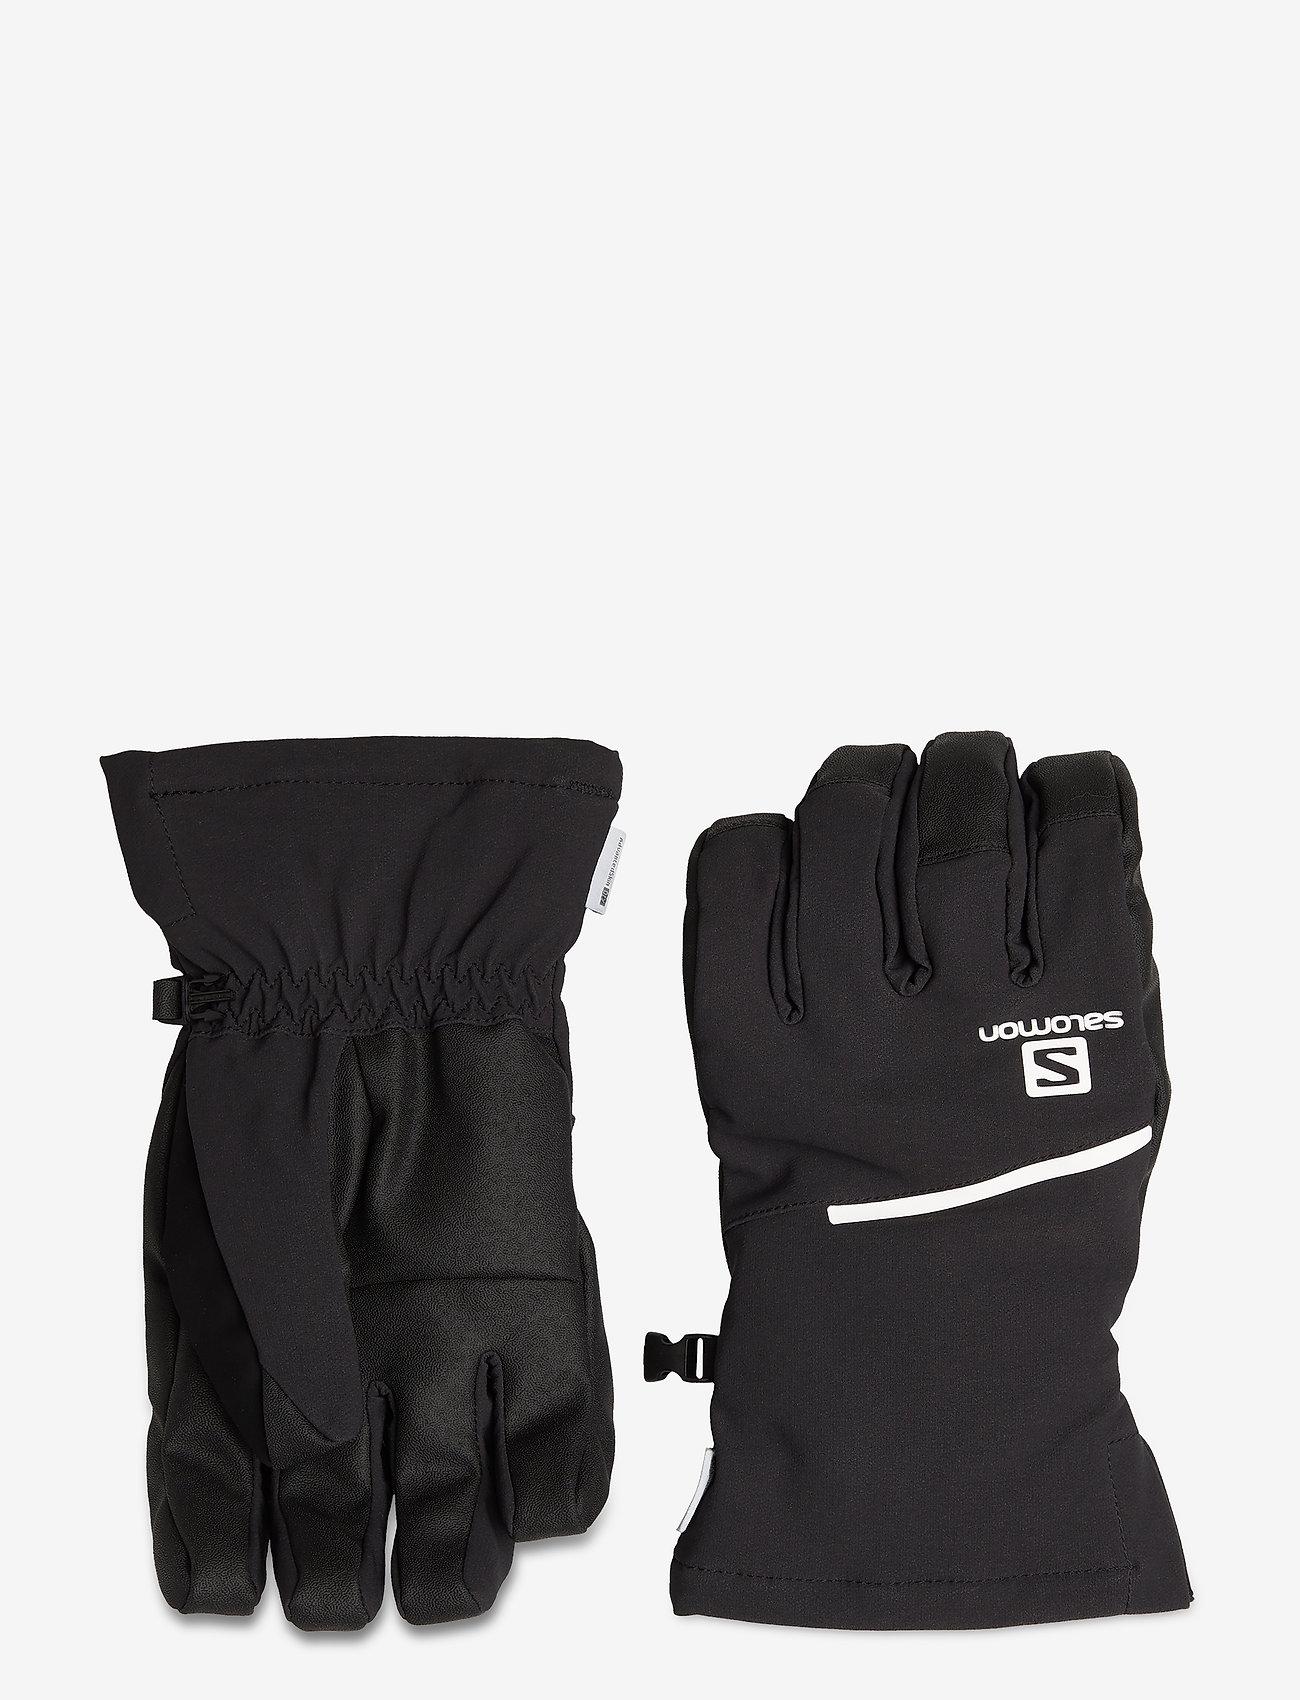 Salomon - PROPELLER ONE M - accessories - black - 0